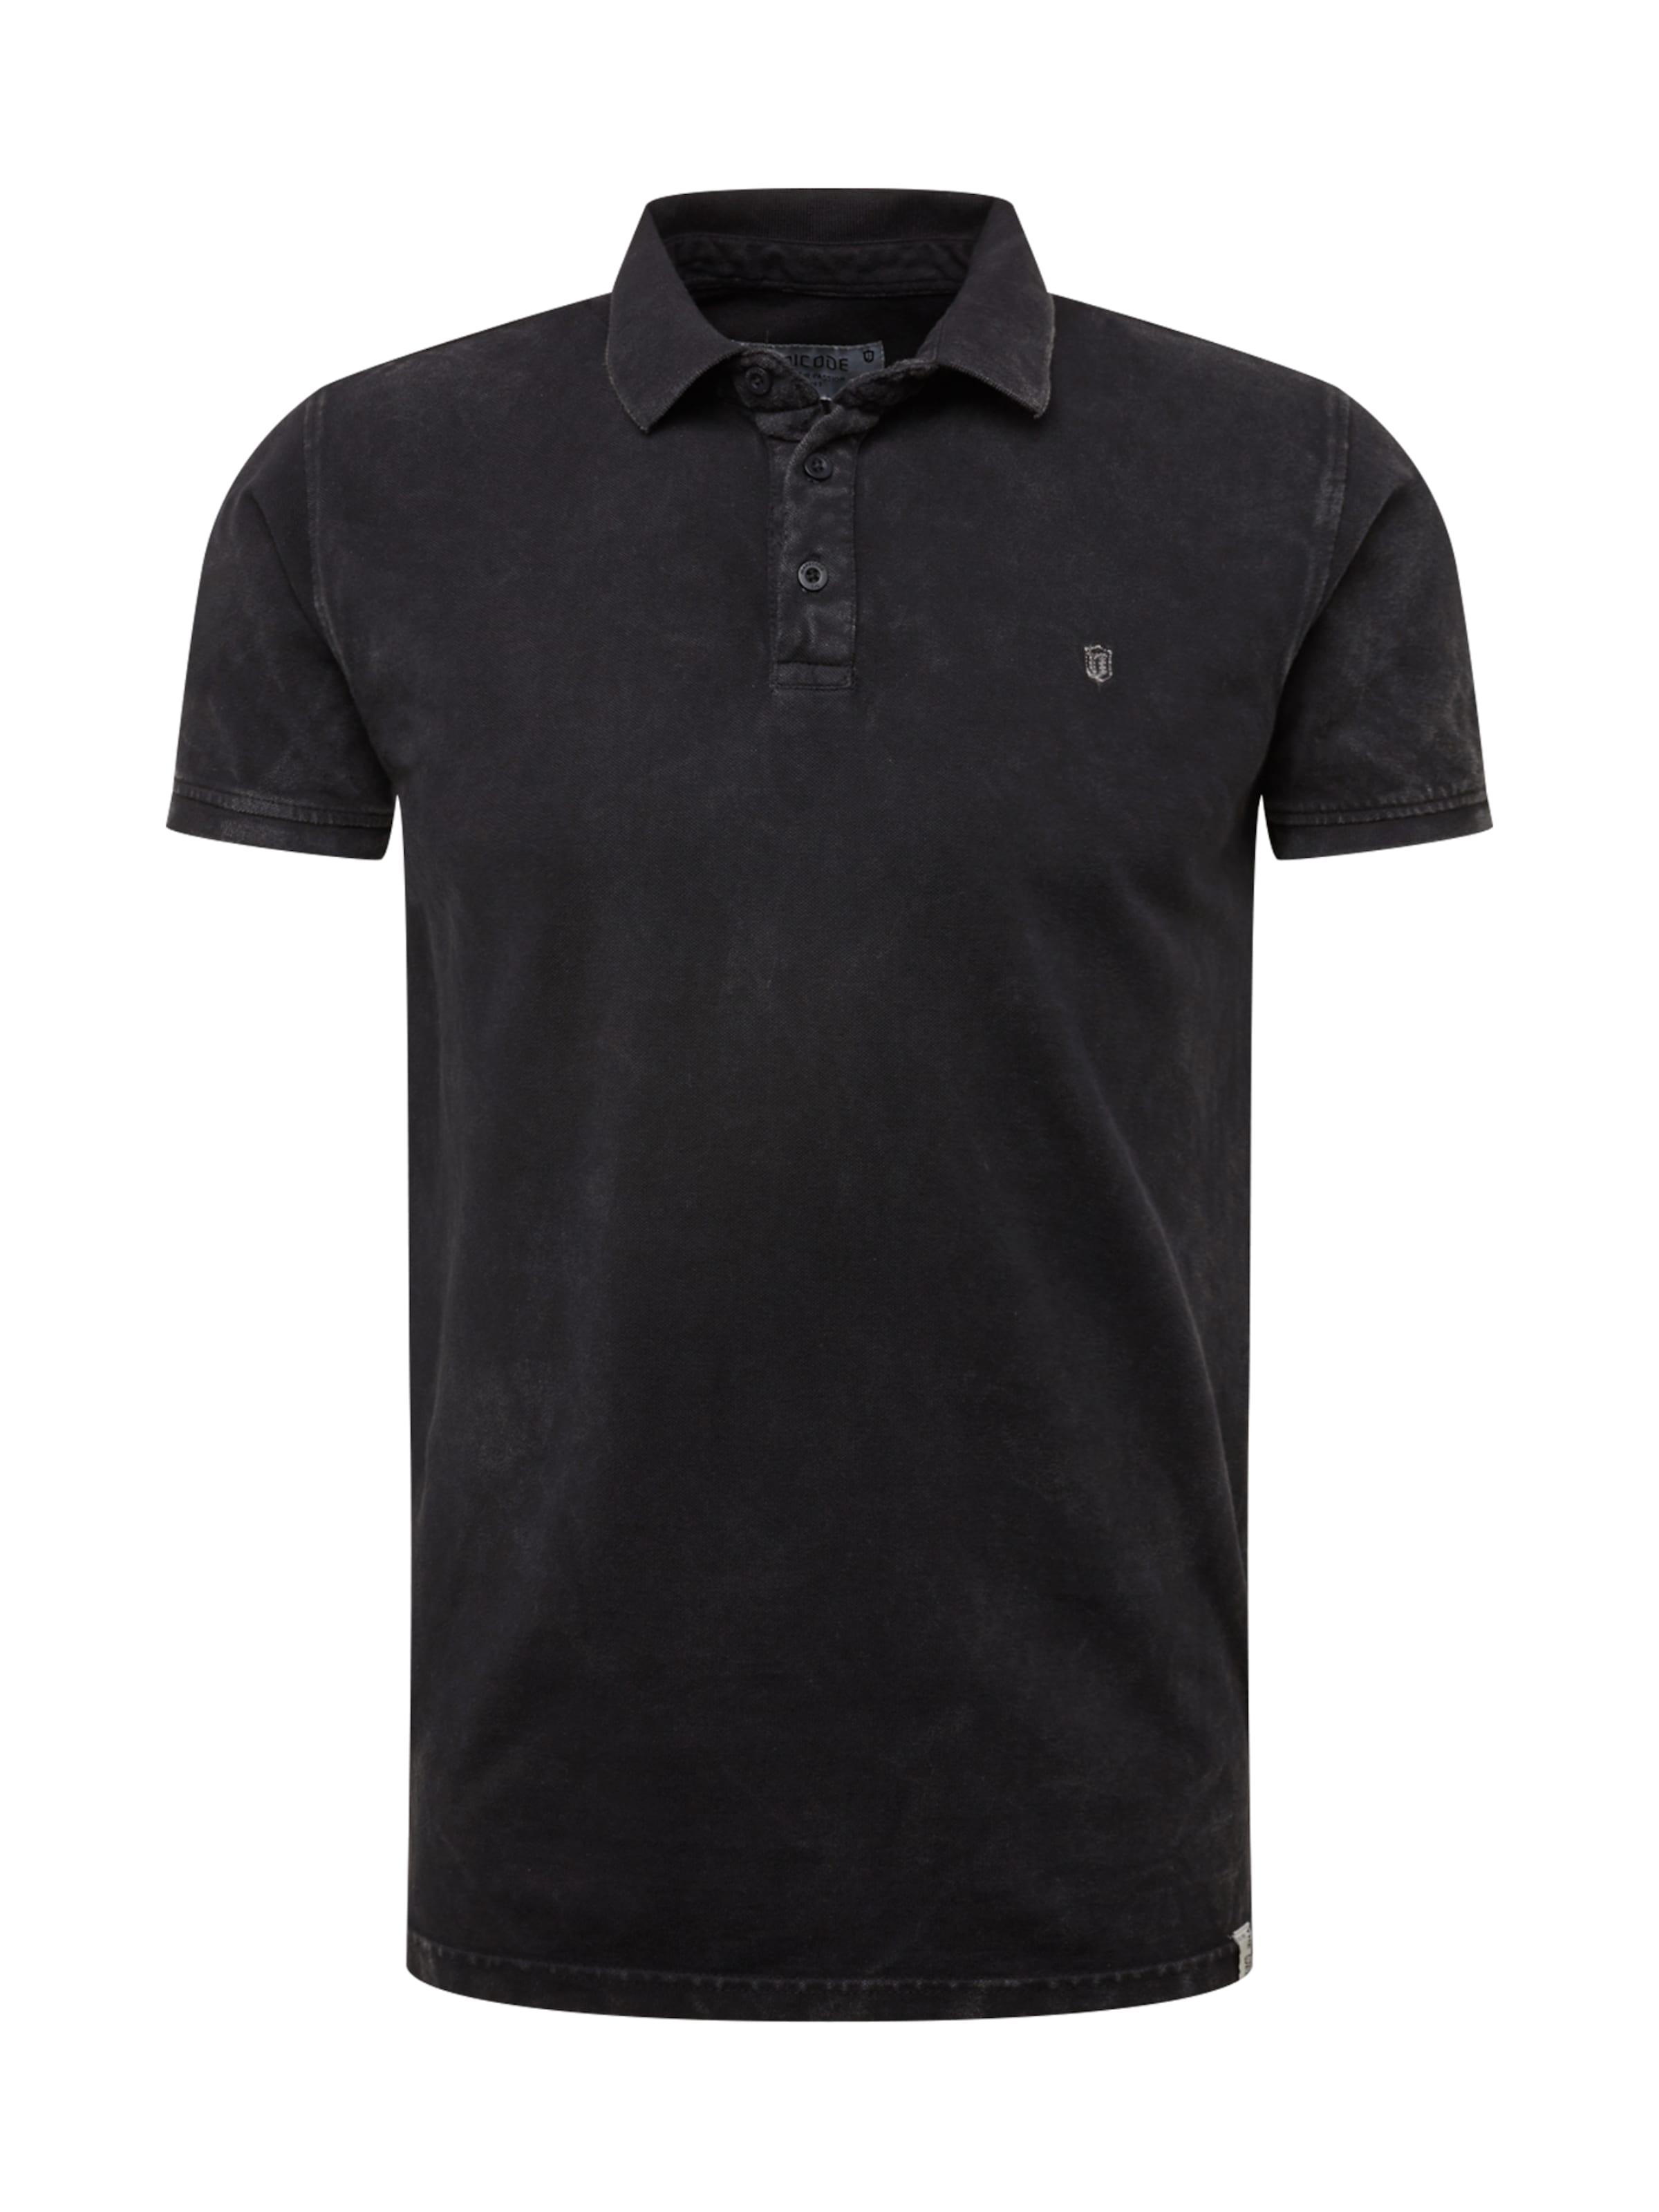 Noir Jeans Indicode 'abbortsford' T shirt En KcF1uJ3Tl